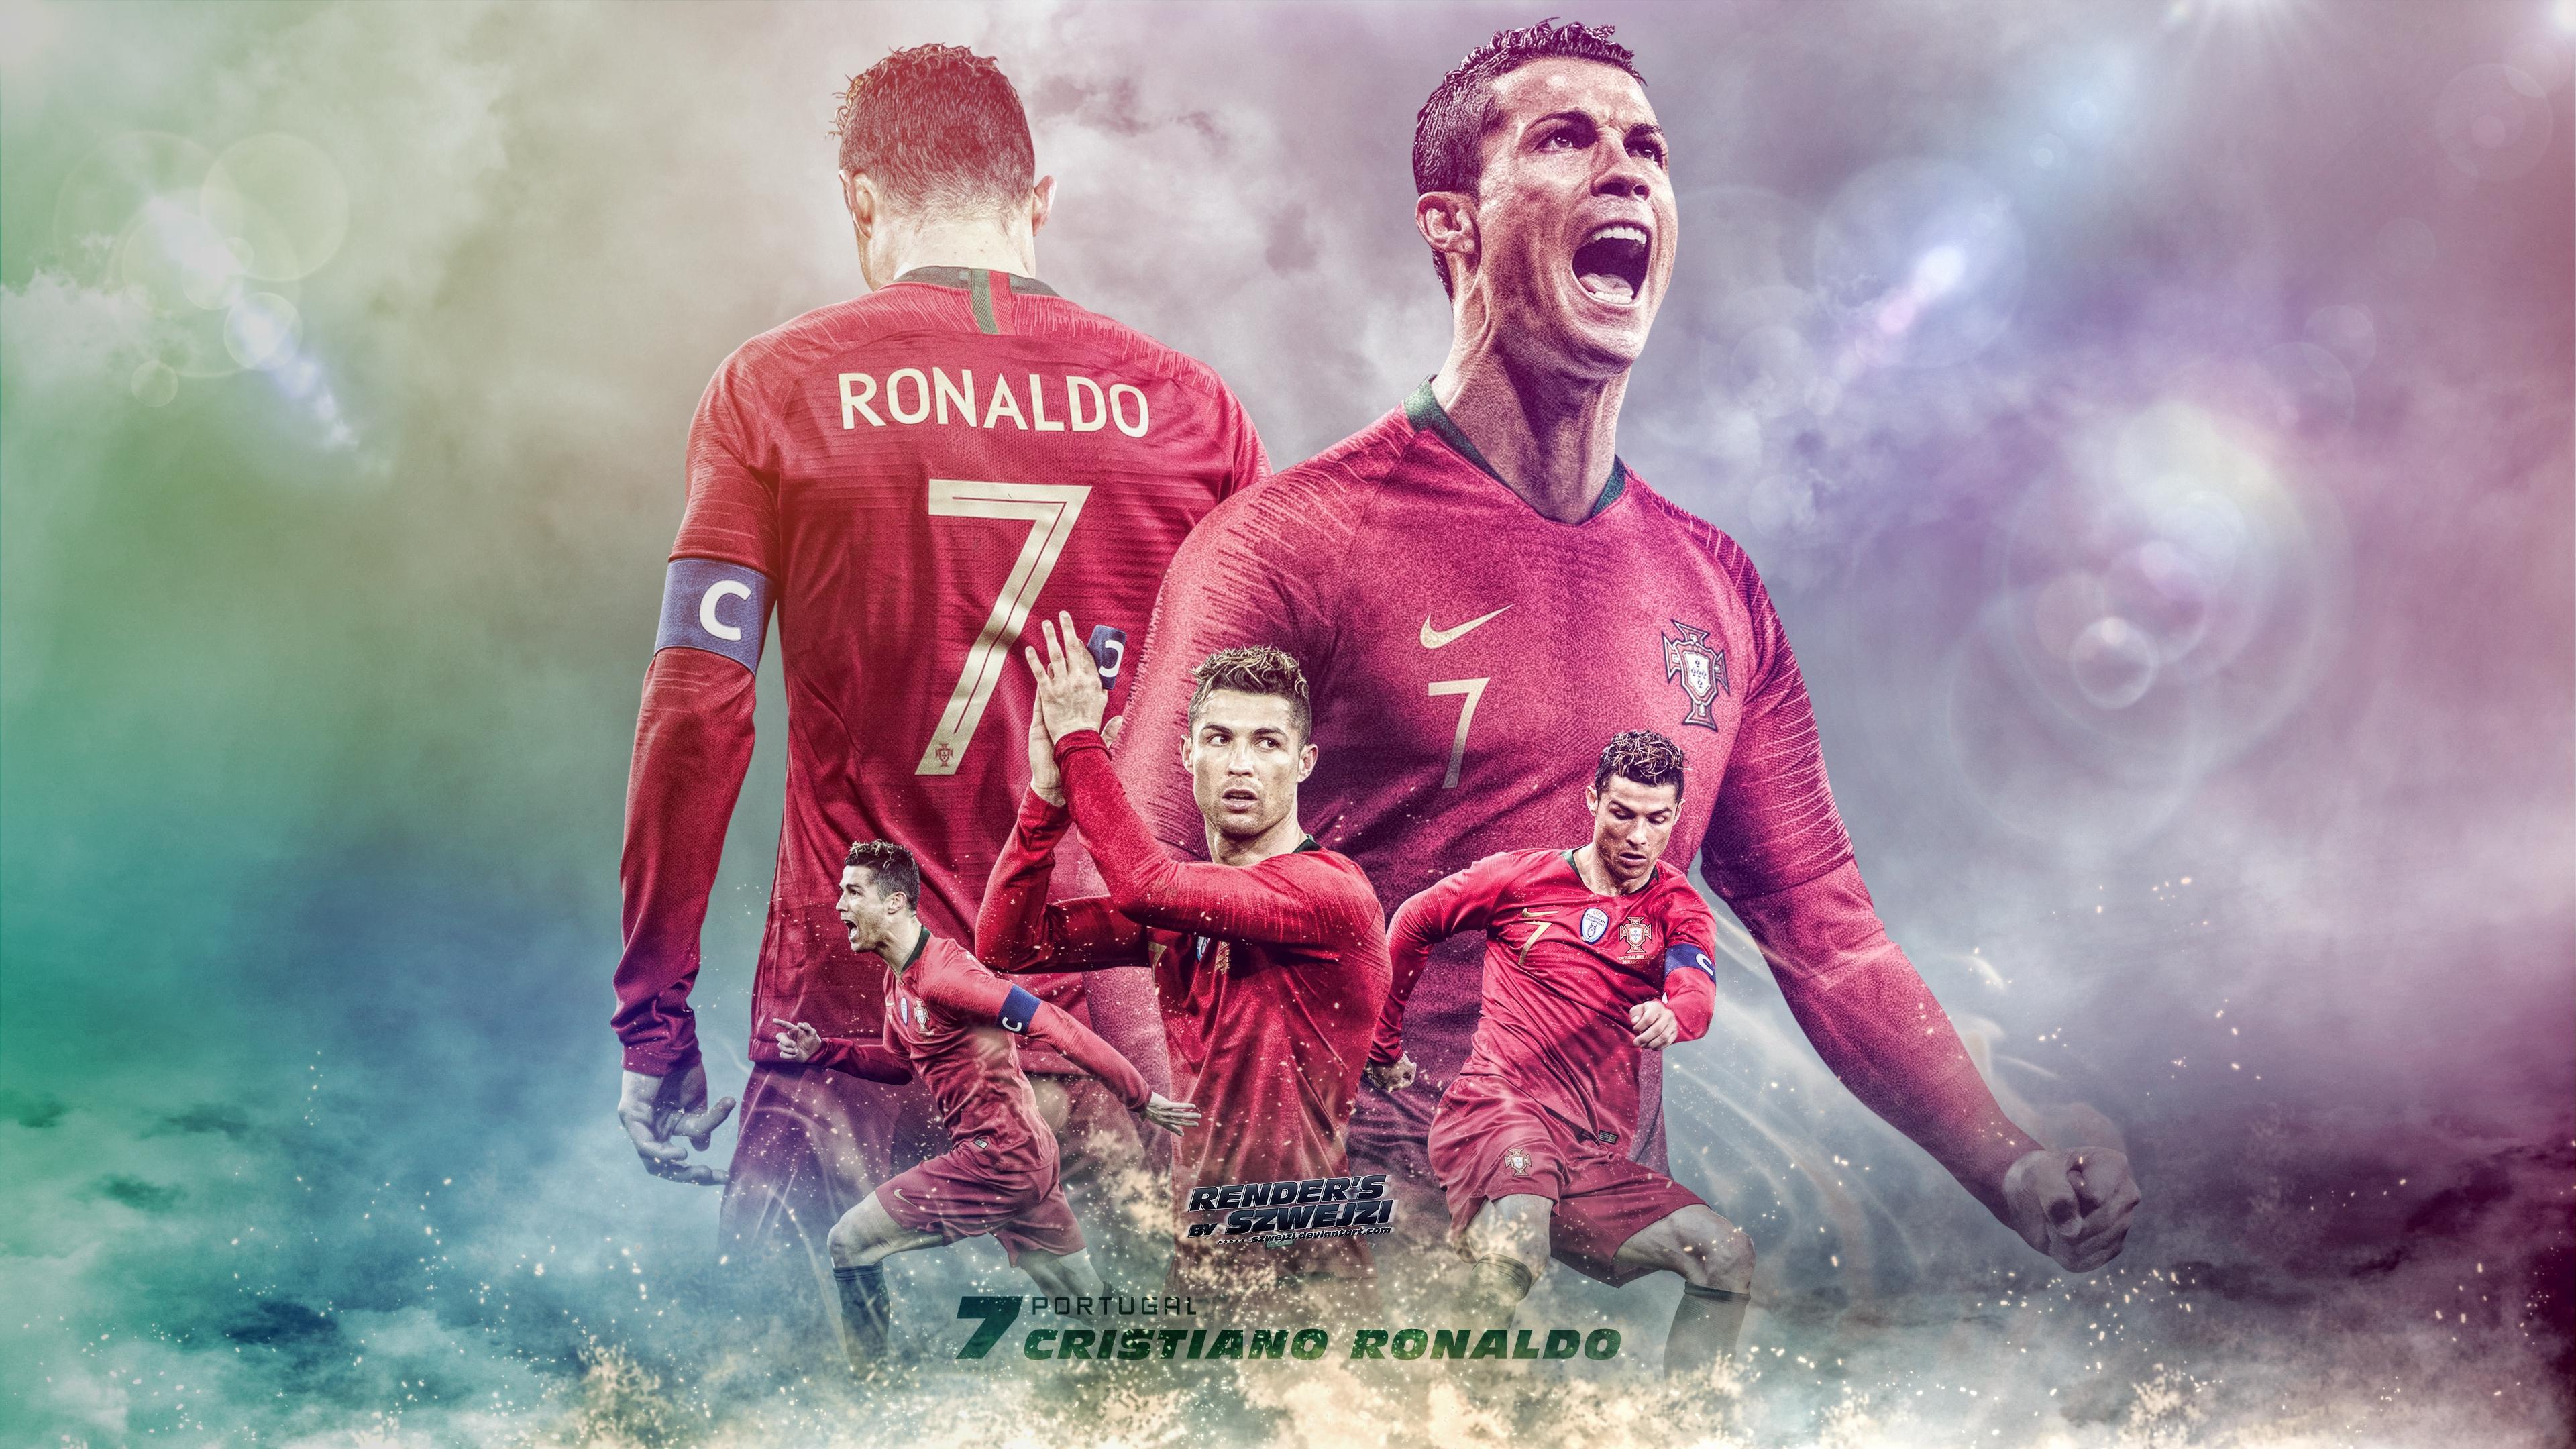 Cristiano Ronaldo 4k Ultra Hd Wallpaper Background Image 3840x2160 Id 1027466 Wallpaper Abyss